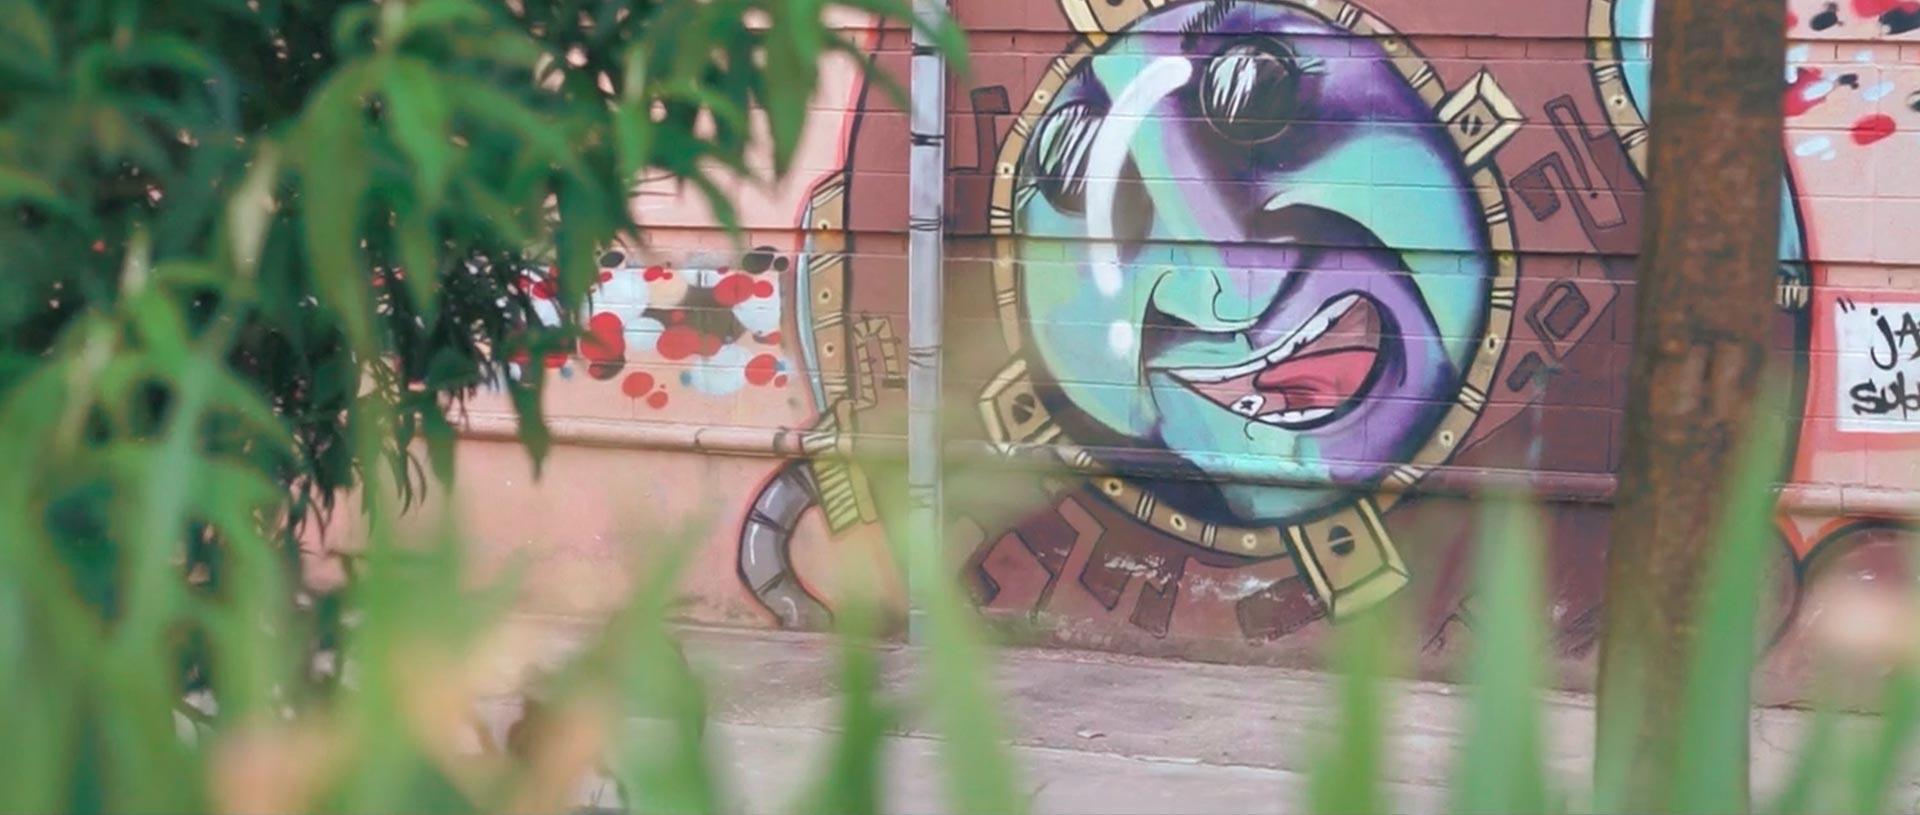 Graffiti de la promo Escenas del graffiti en Granada